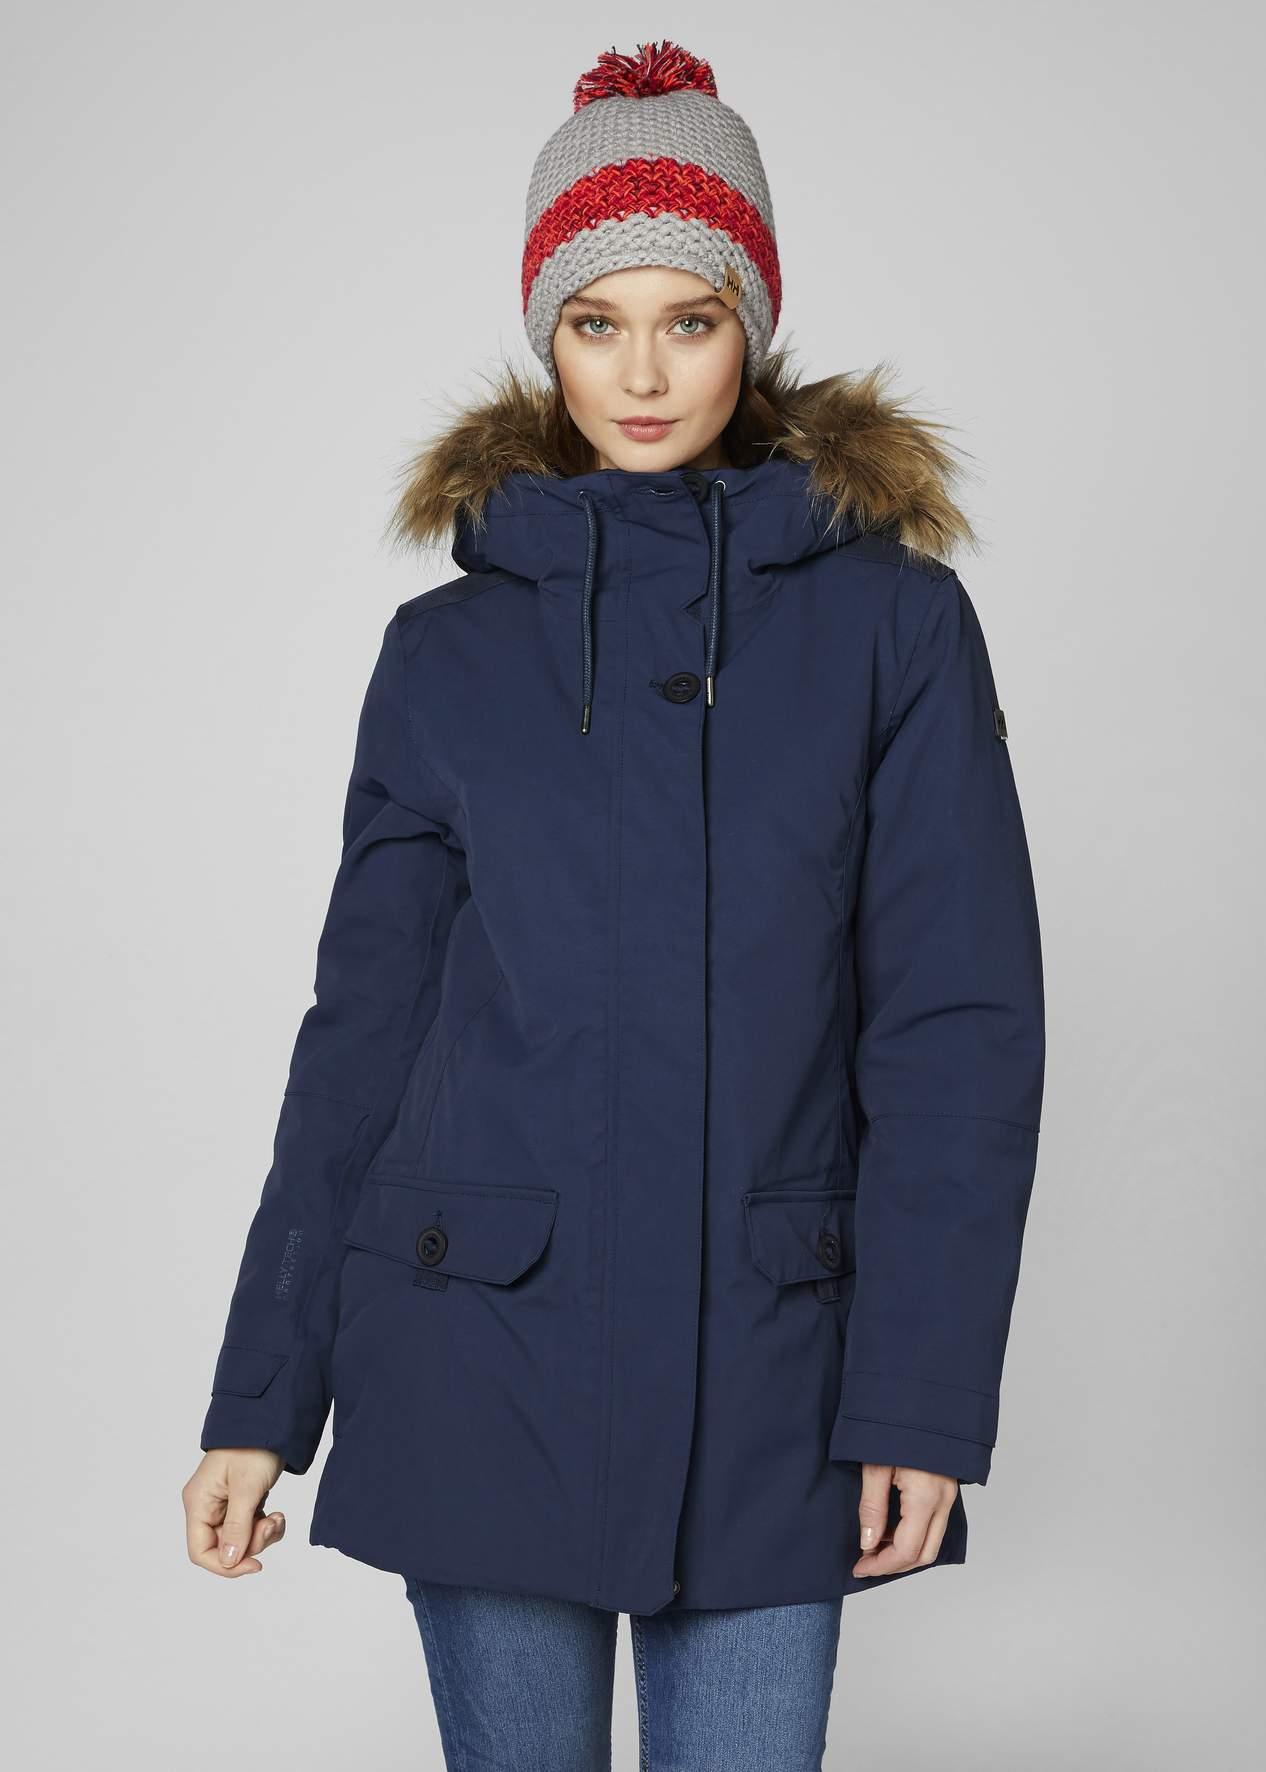 new items utterly stylish outlet on sale Women's Helly Hansen SVALBARD 2 Parka-Evening Blue - Sklep ...